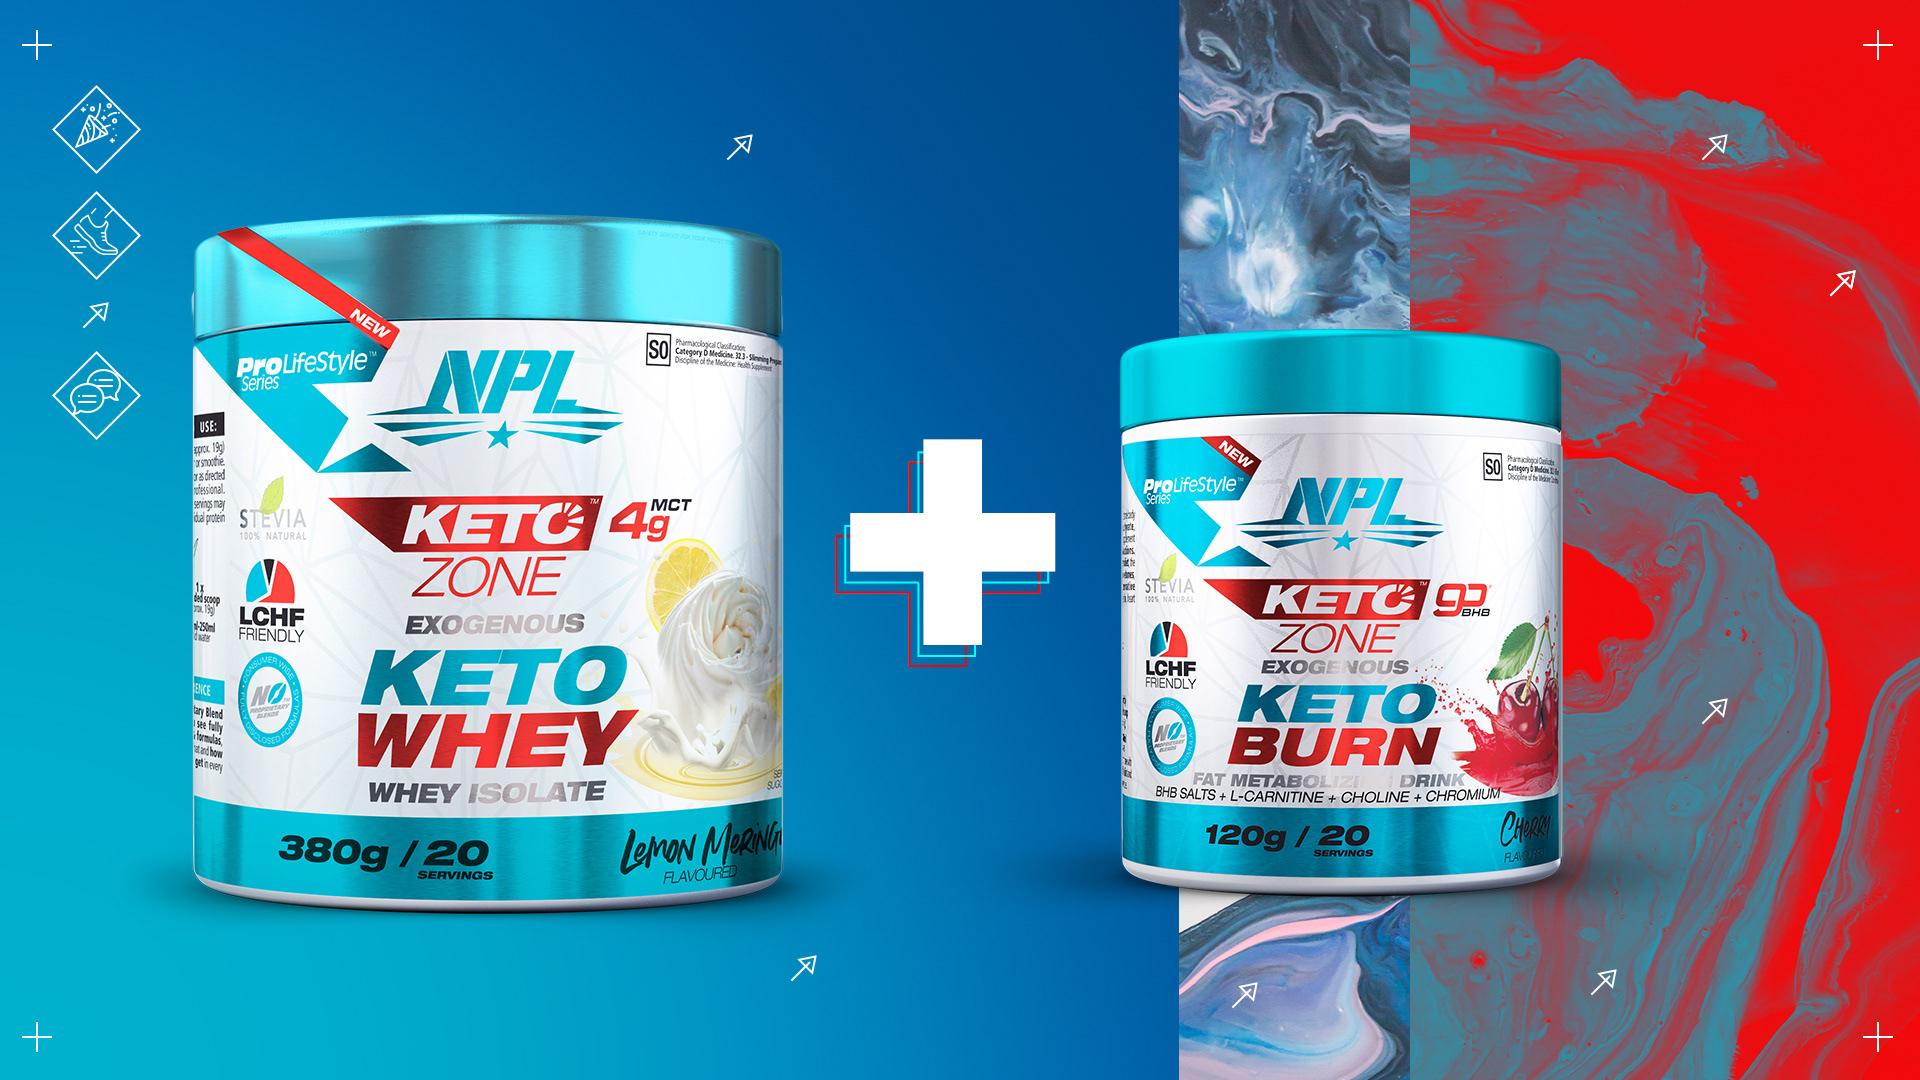 Product package design of NPL's Keto Zone range